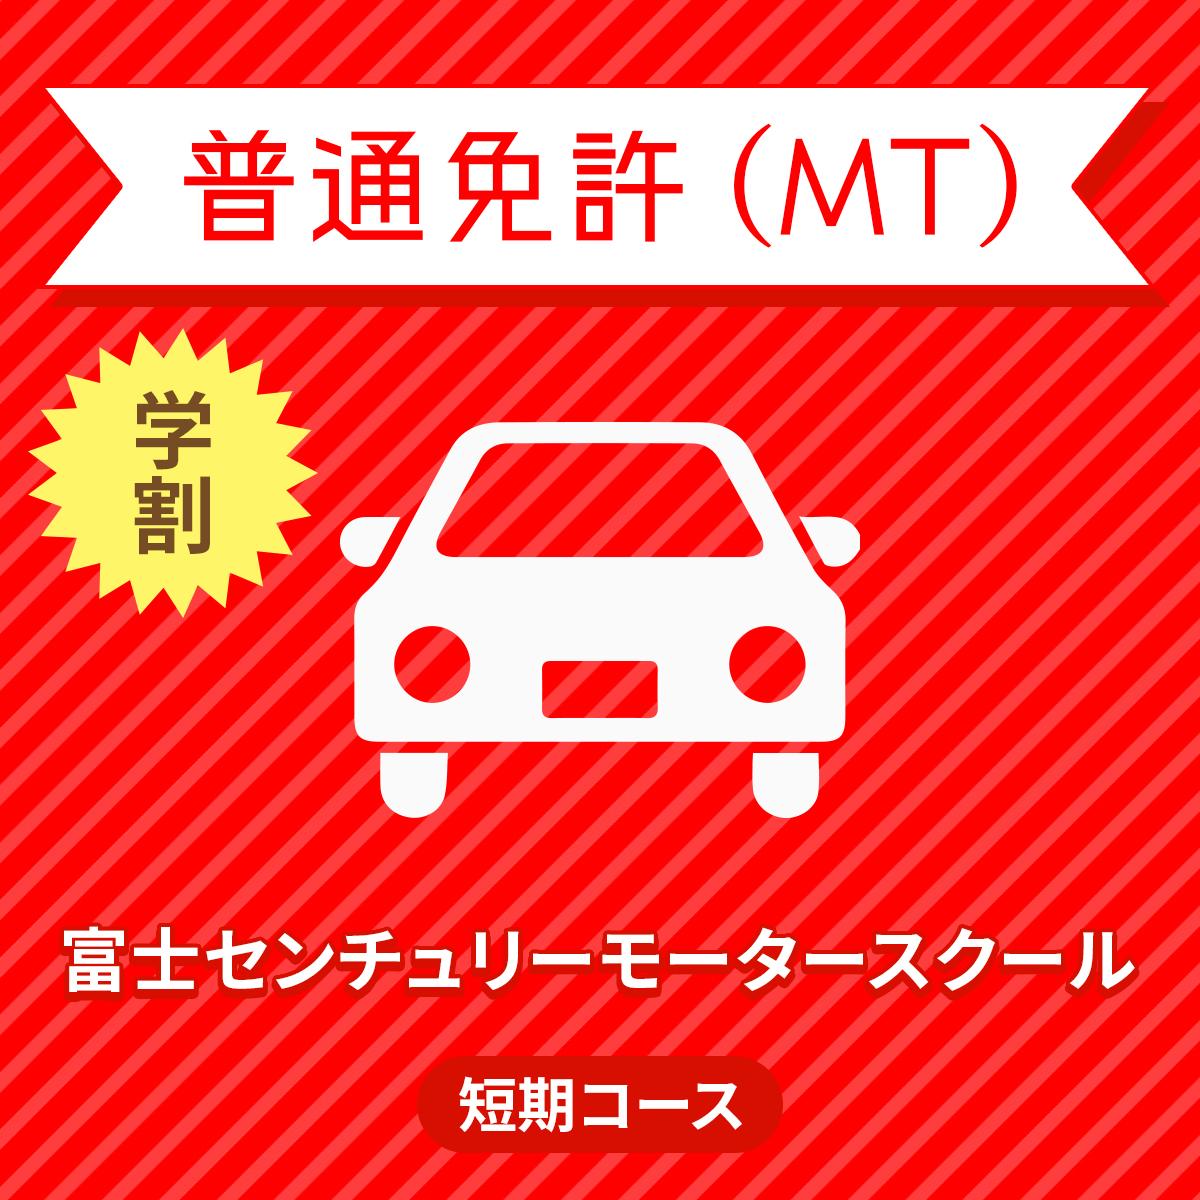 【静岡県裾野市】普通車MT短期コース(高校生料金)<免許なし/原付免許所持対象>